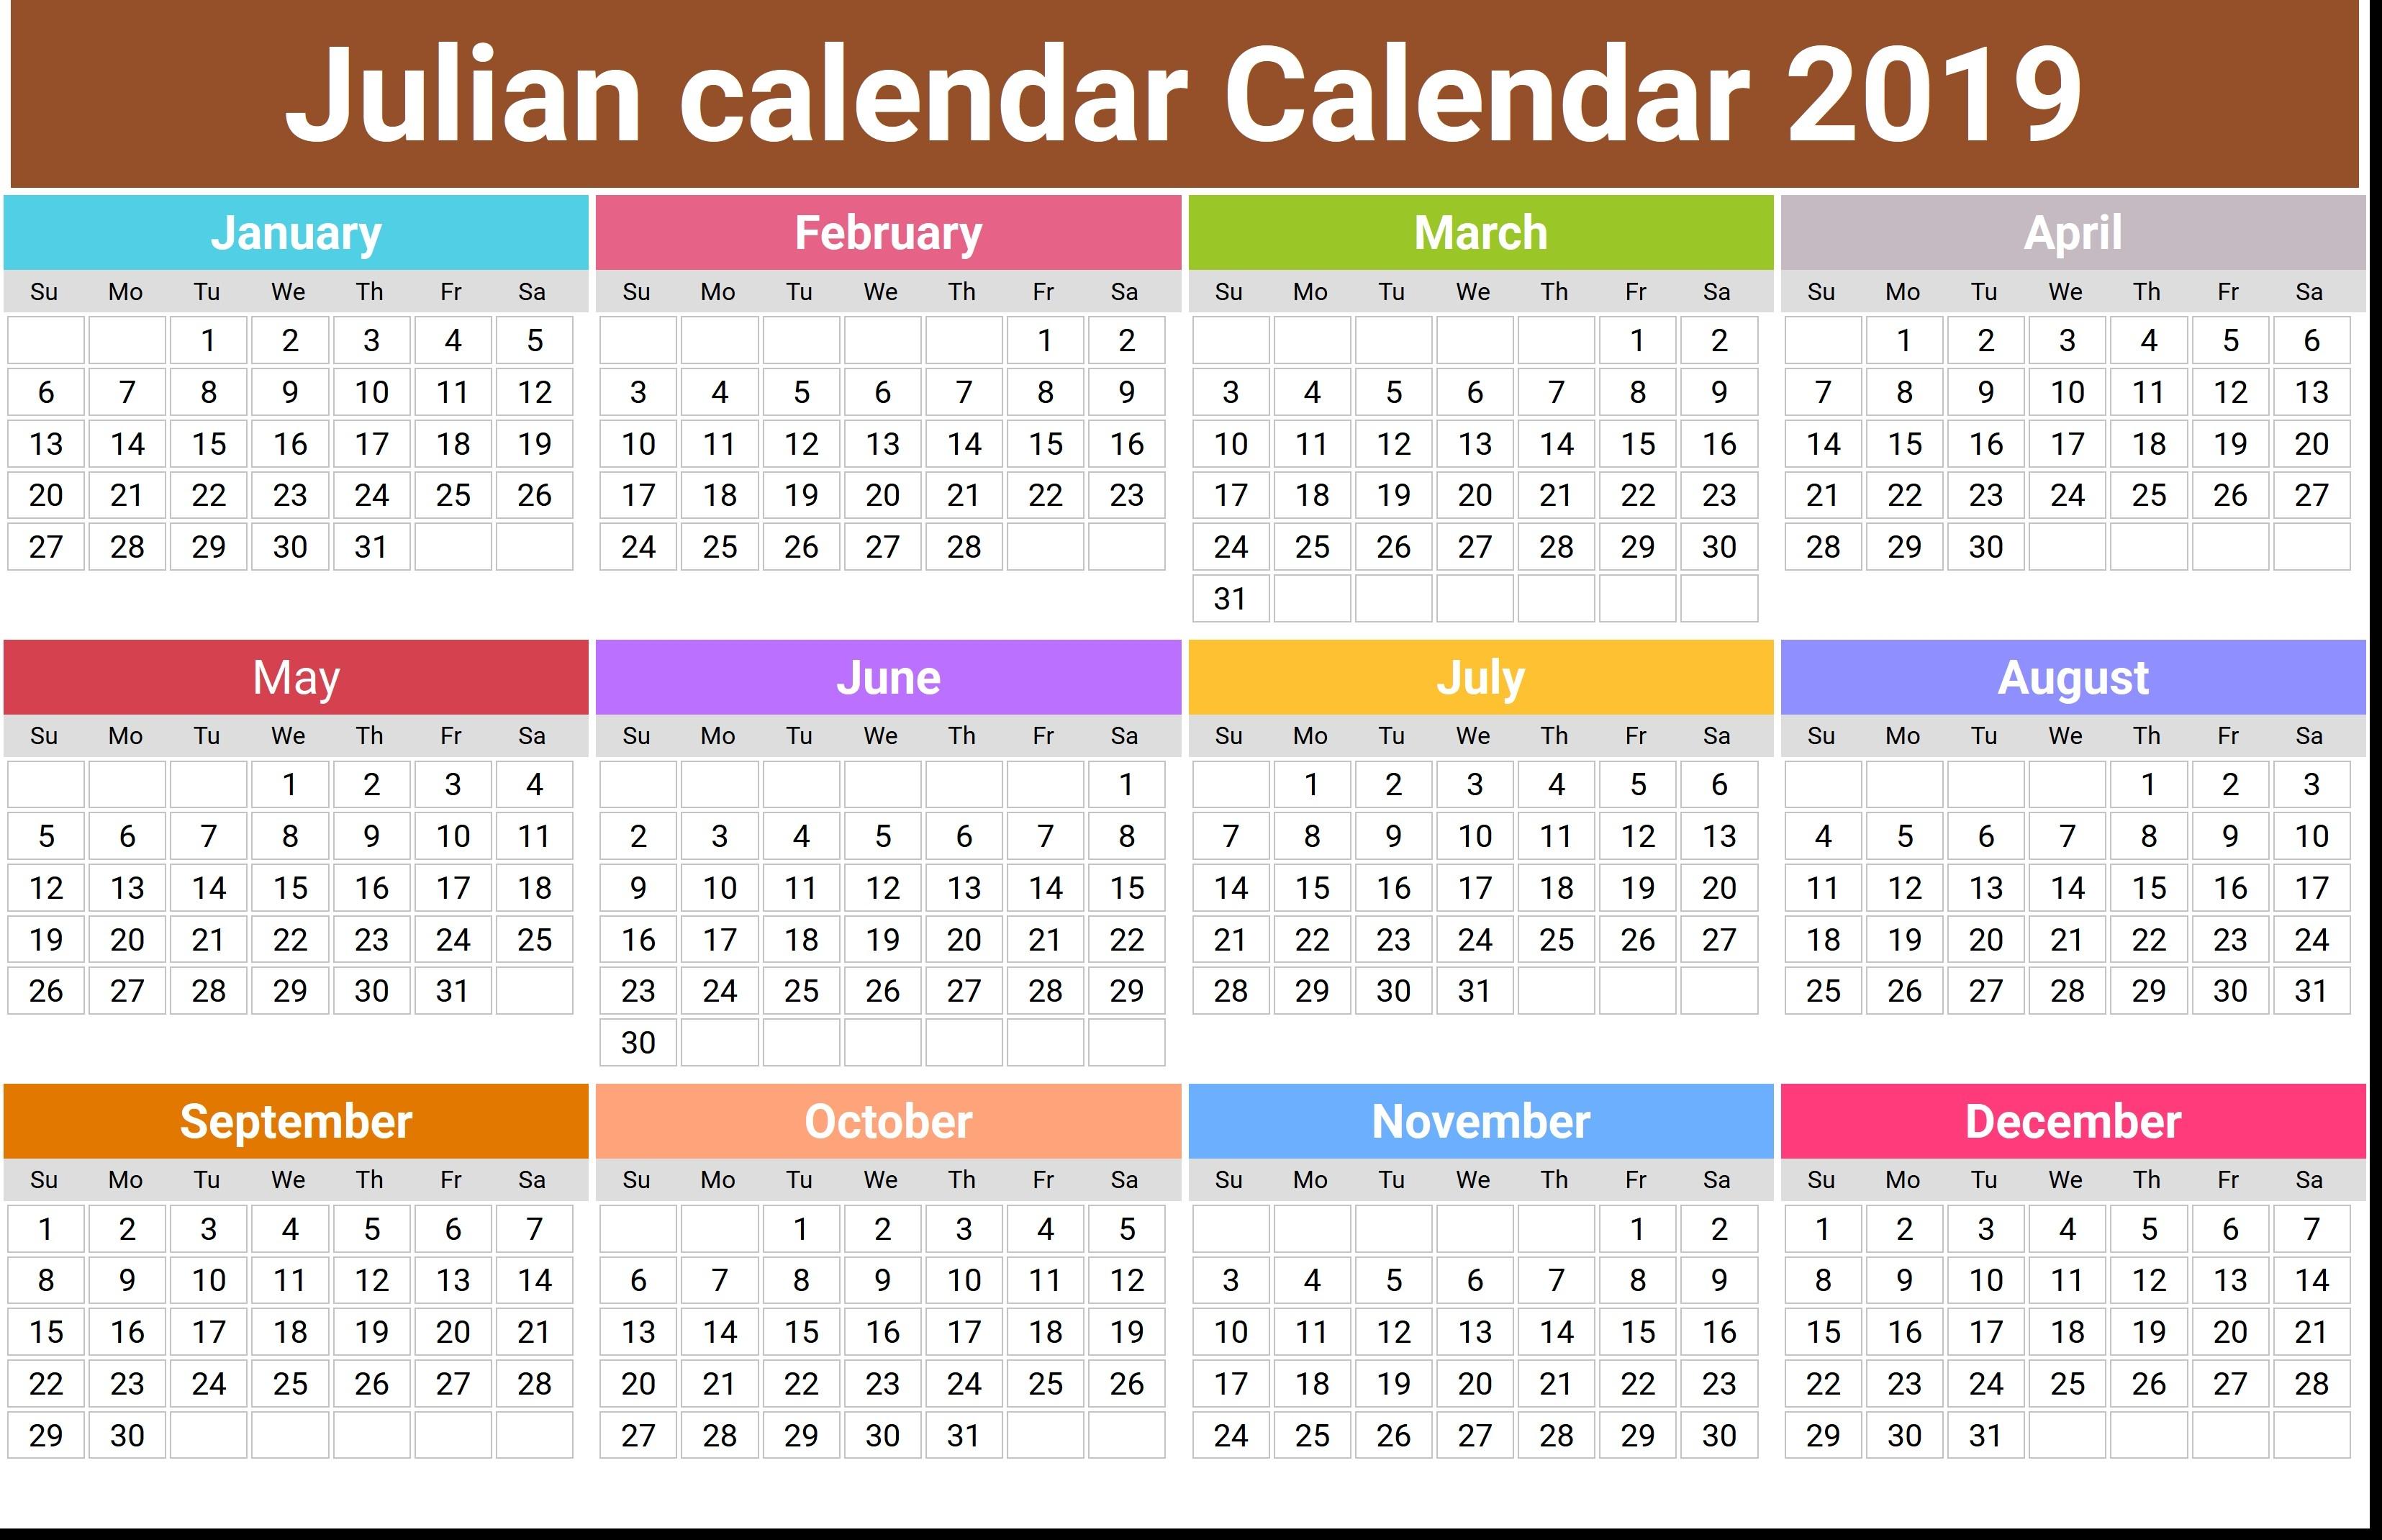 2019 Julian Calendar Printable | Isacl